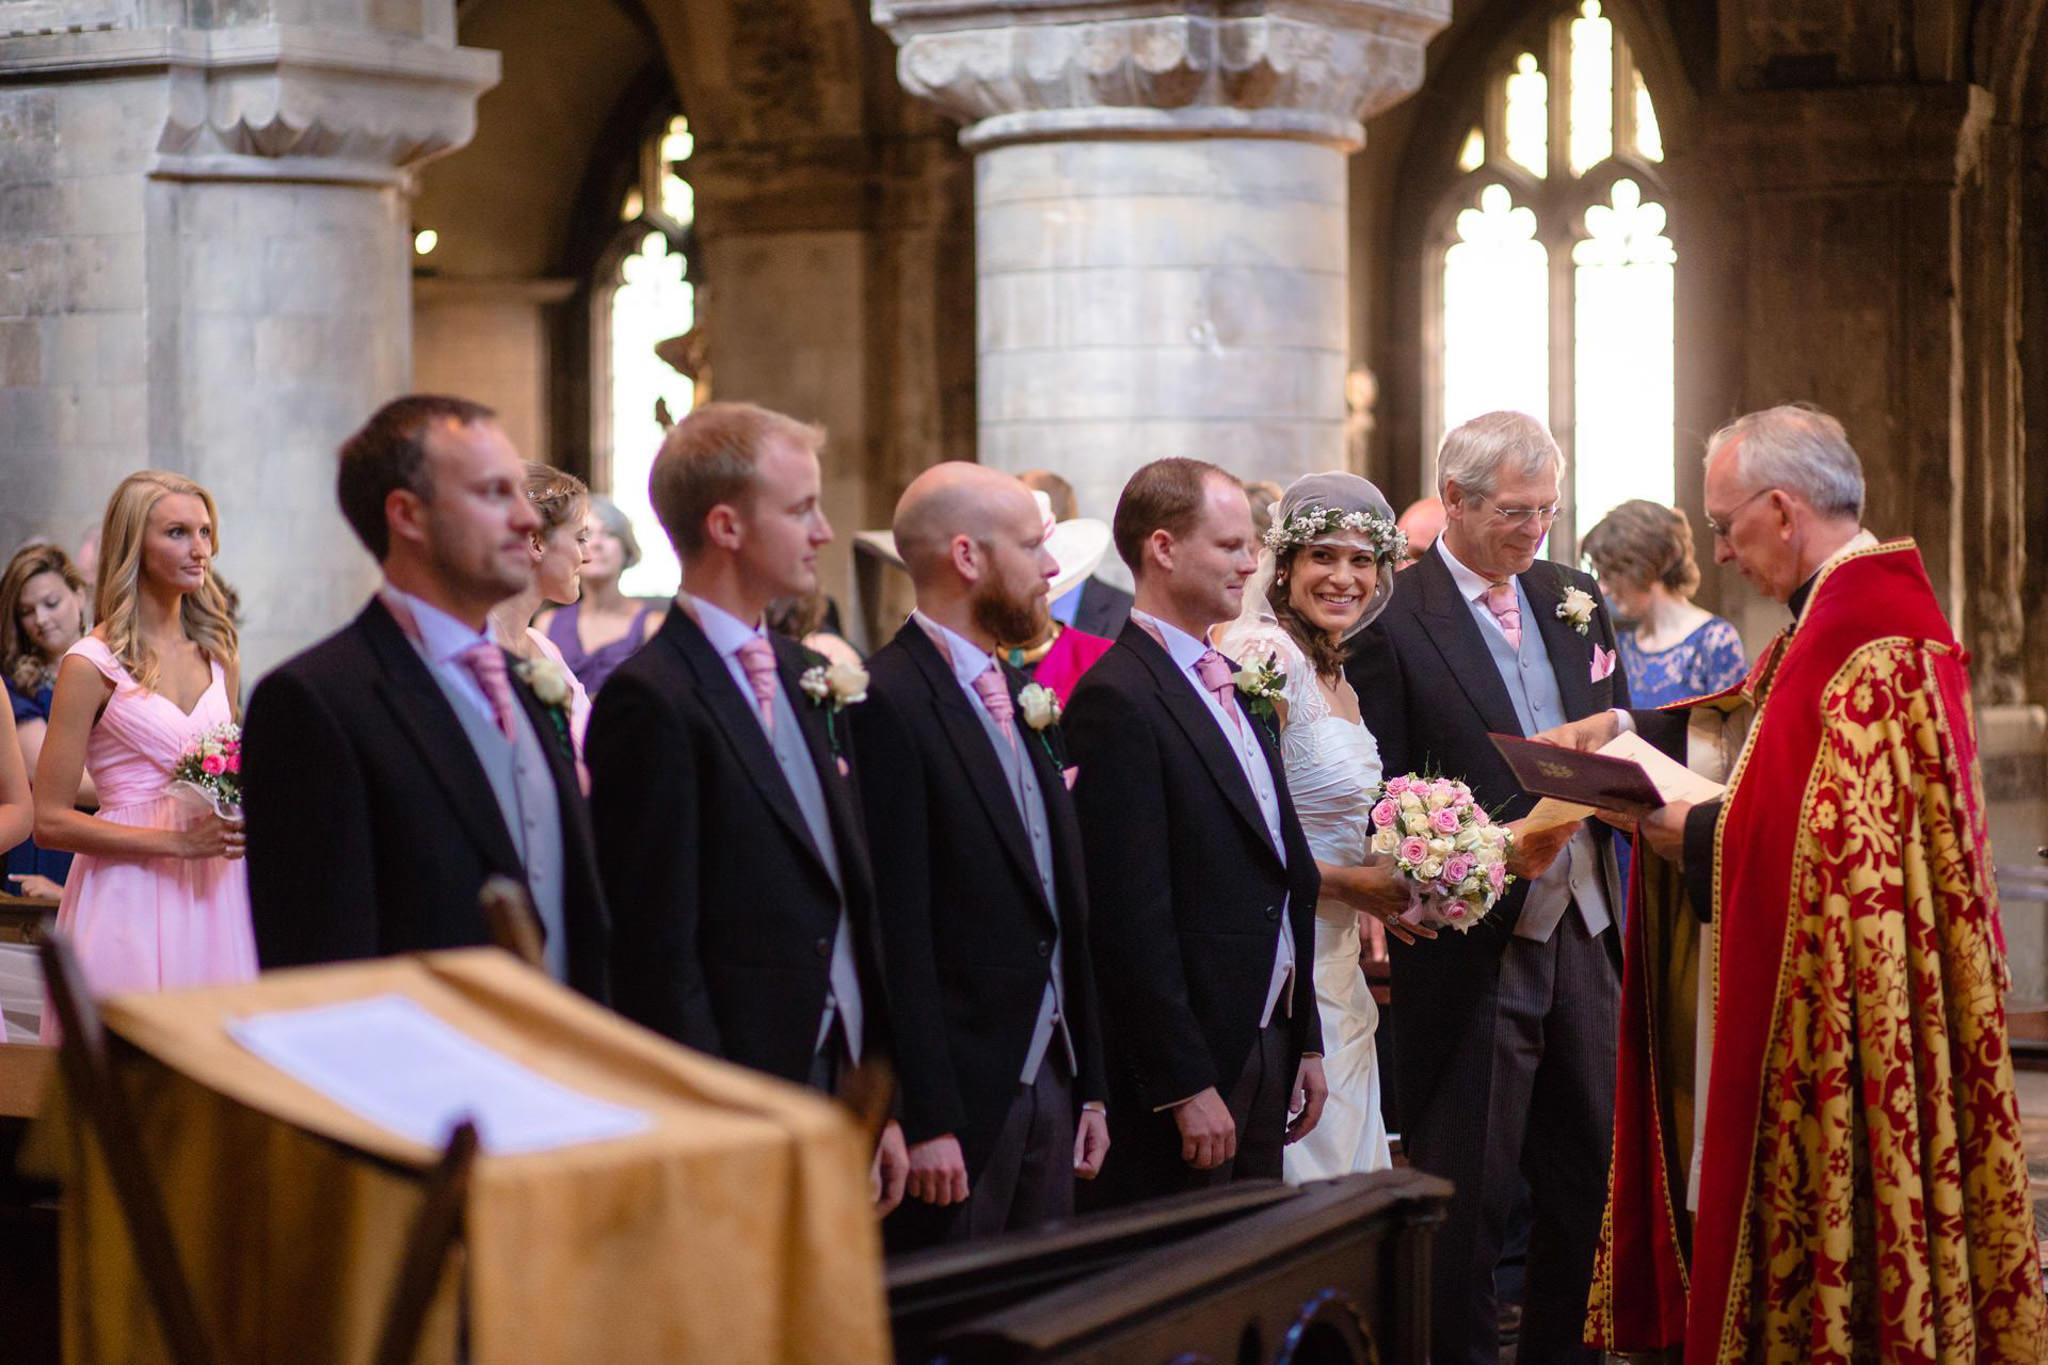 St. Pancras Renaissance hotel wedding pries reading